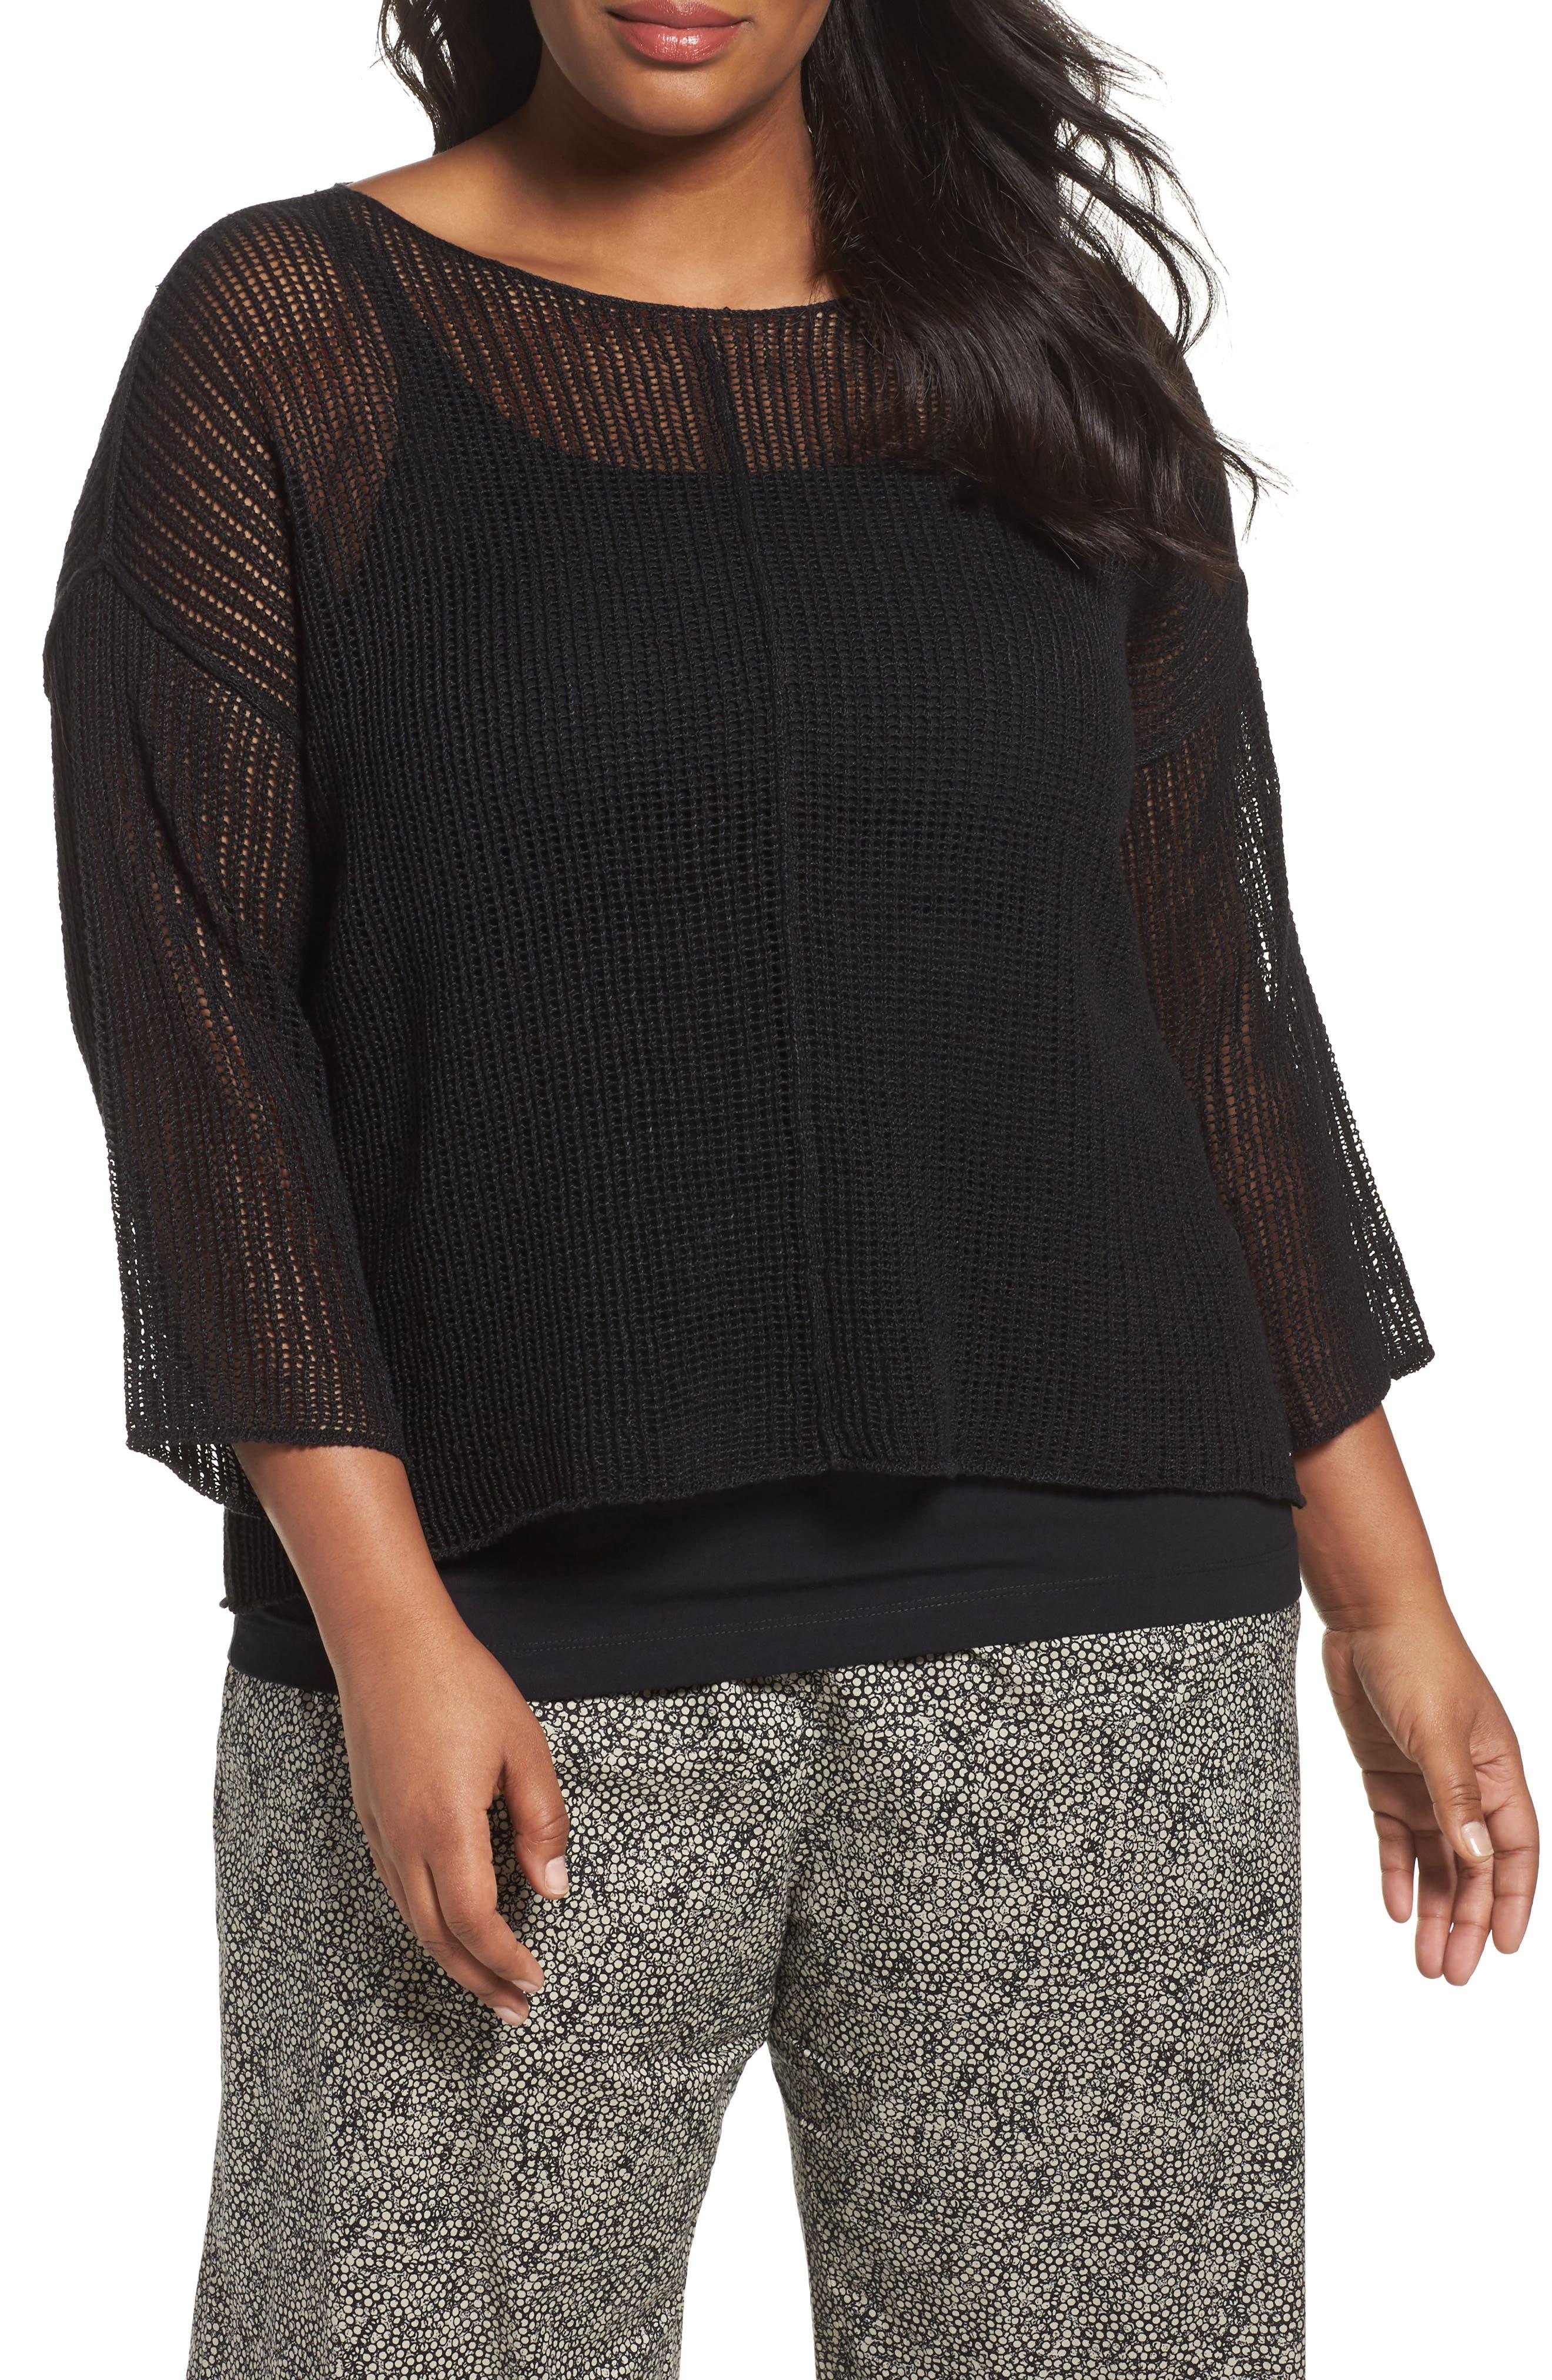 Organic Linen Mesh Knit Top,                             Main thumbnail 1, color,                             Black